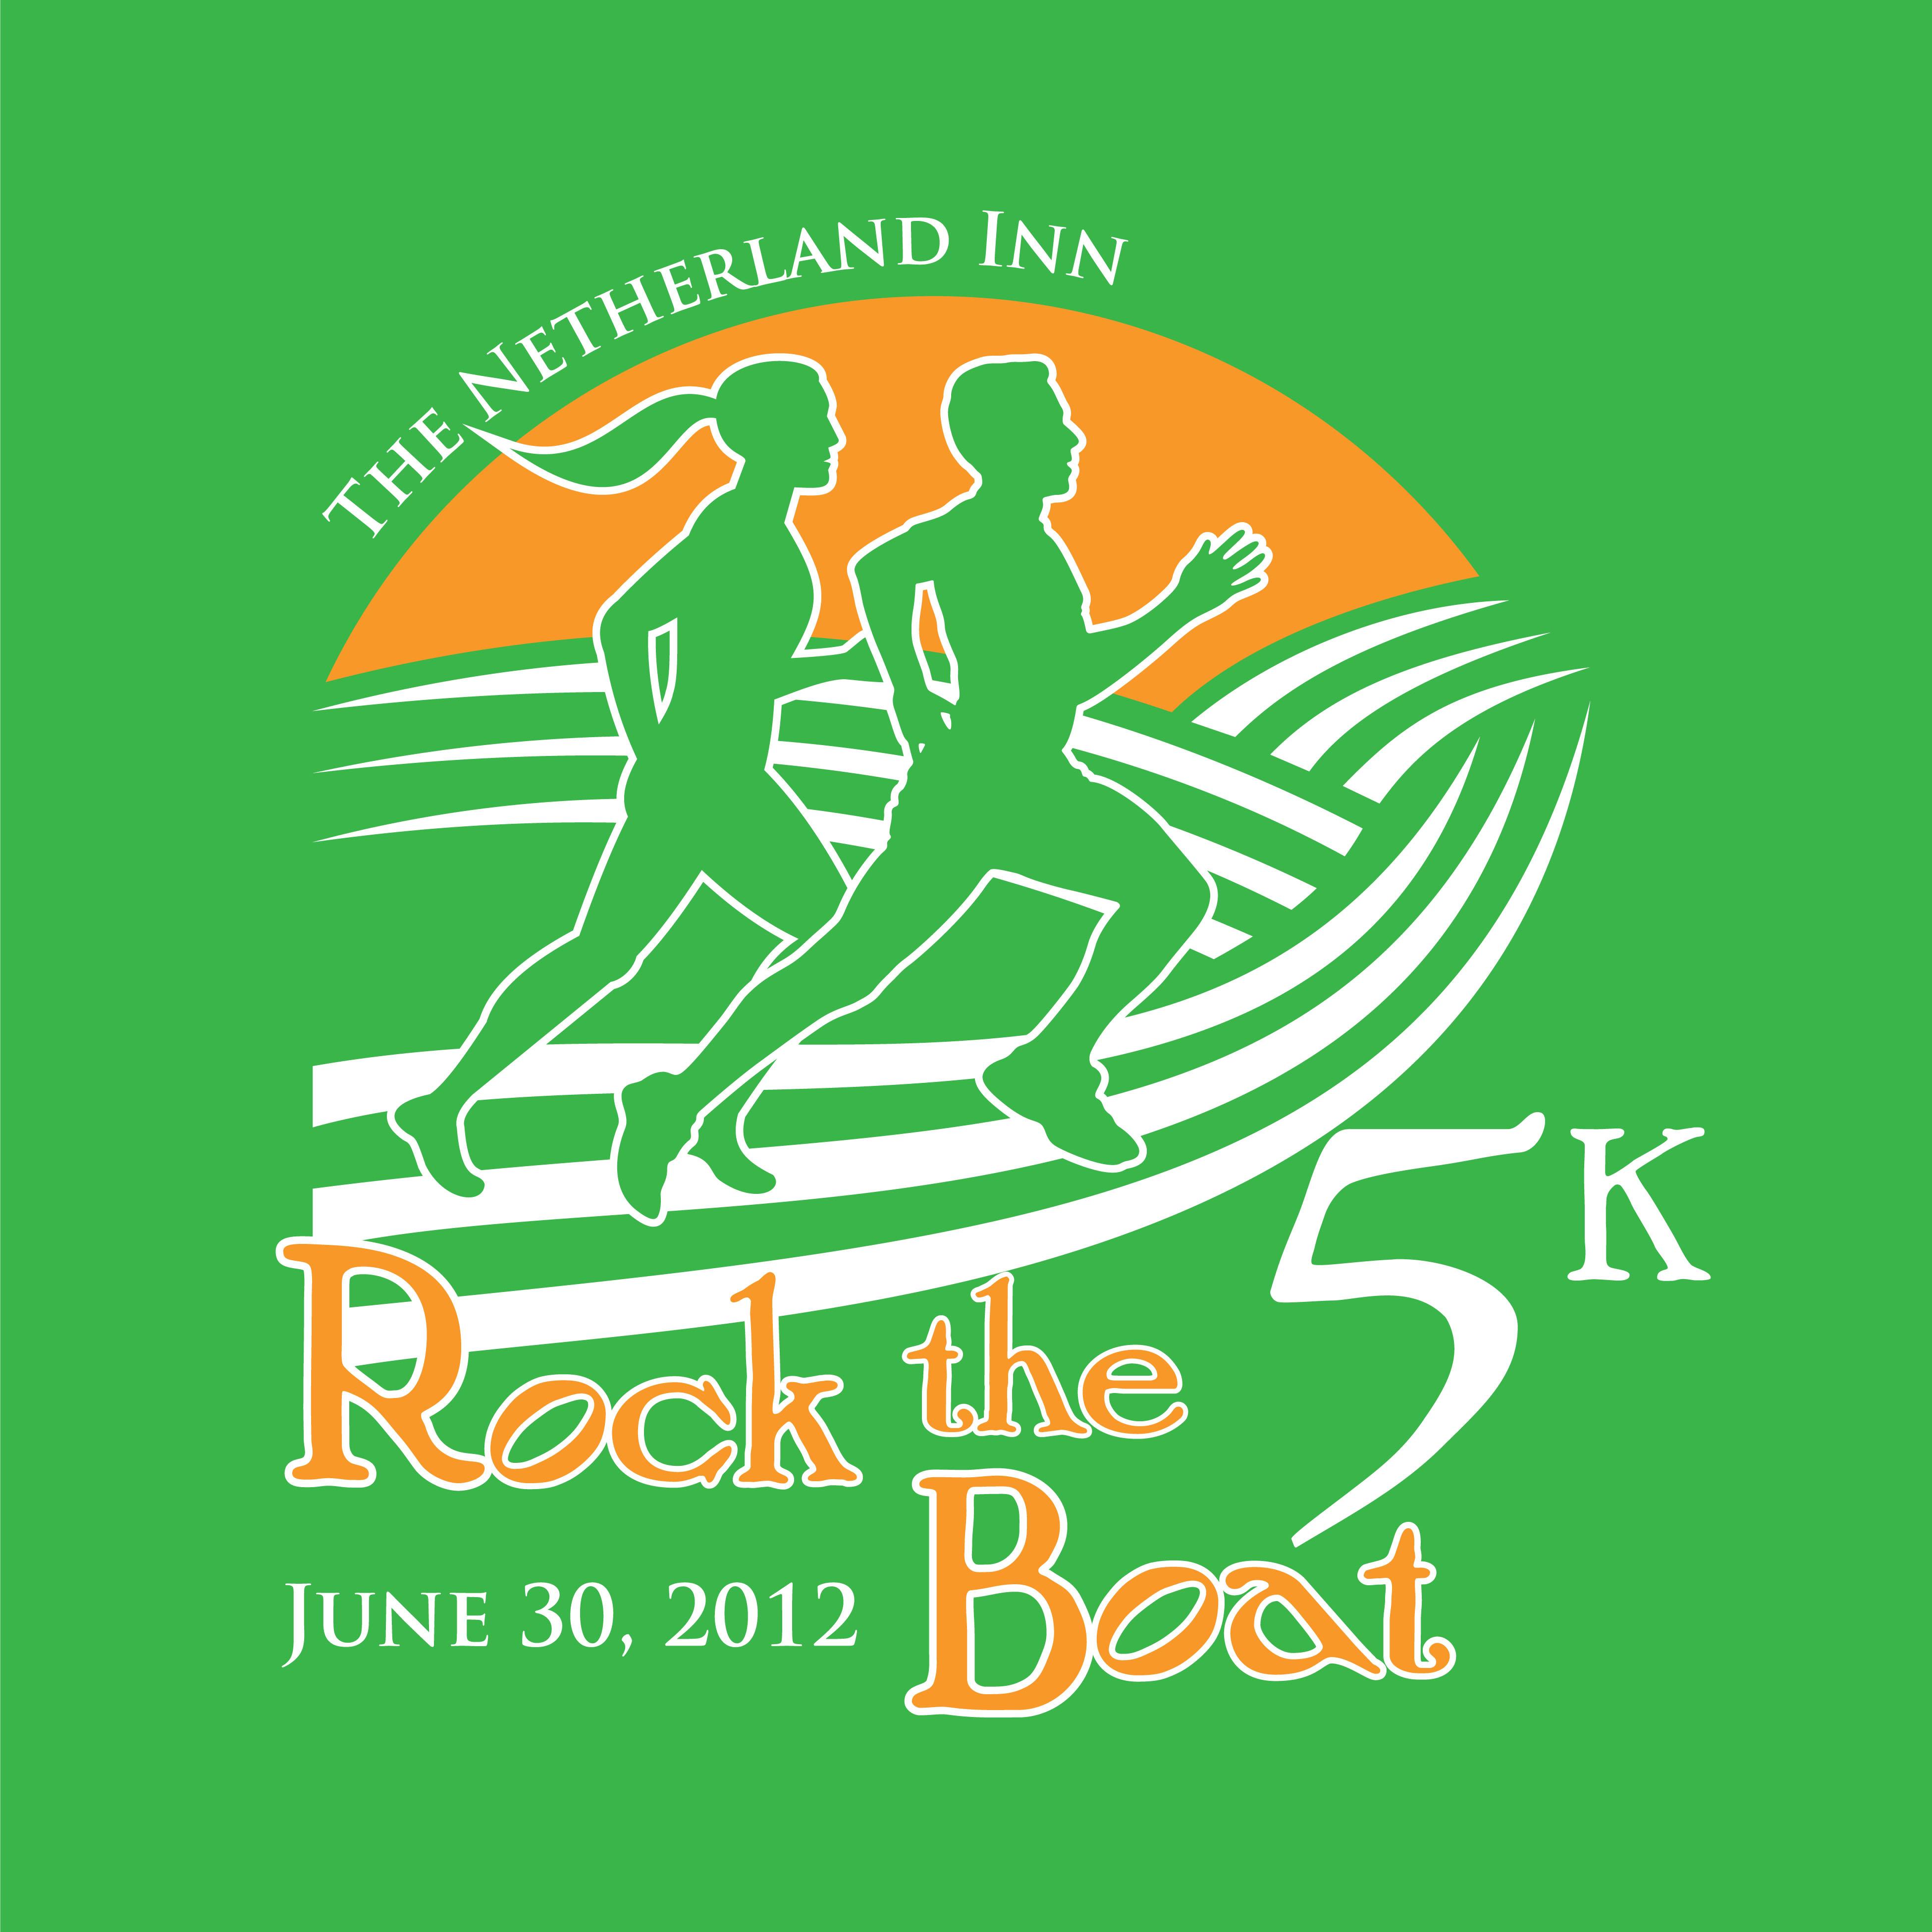 Rock the Boat 5K